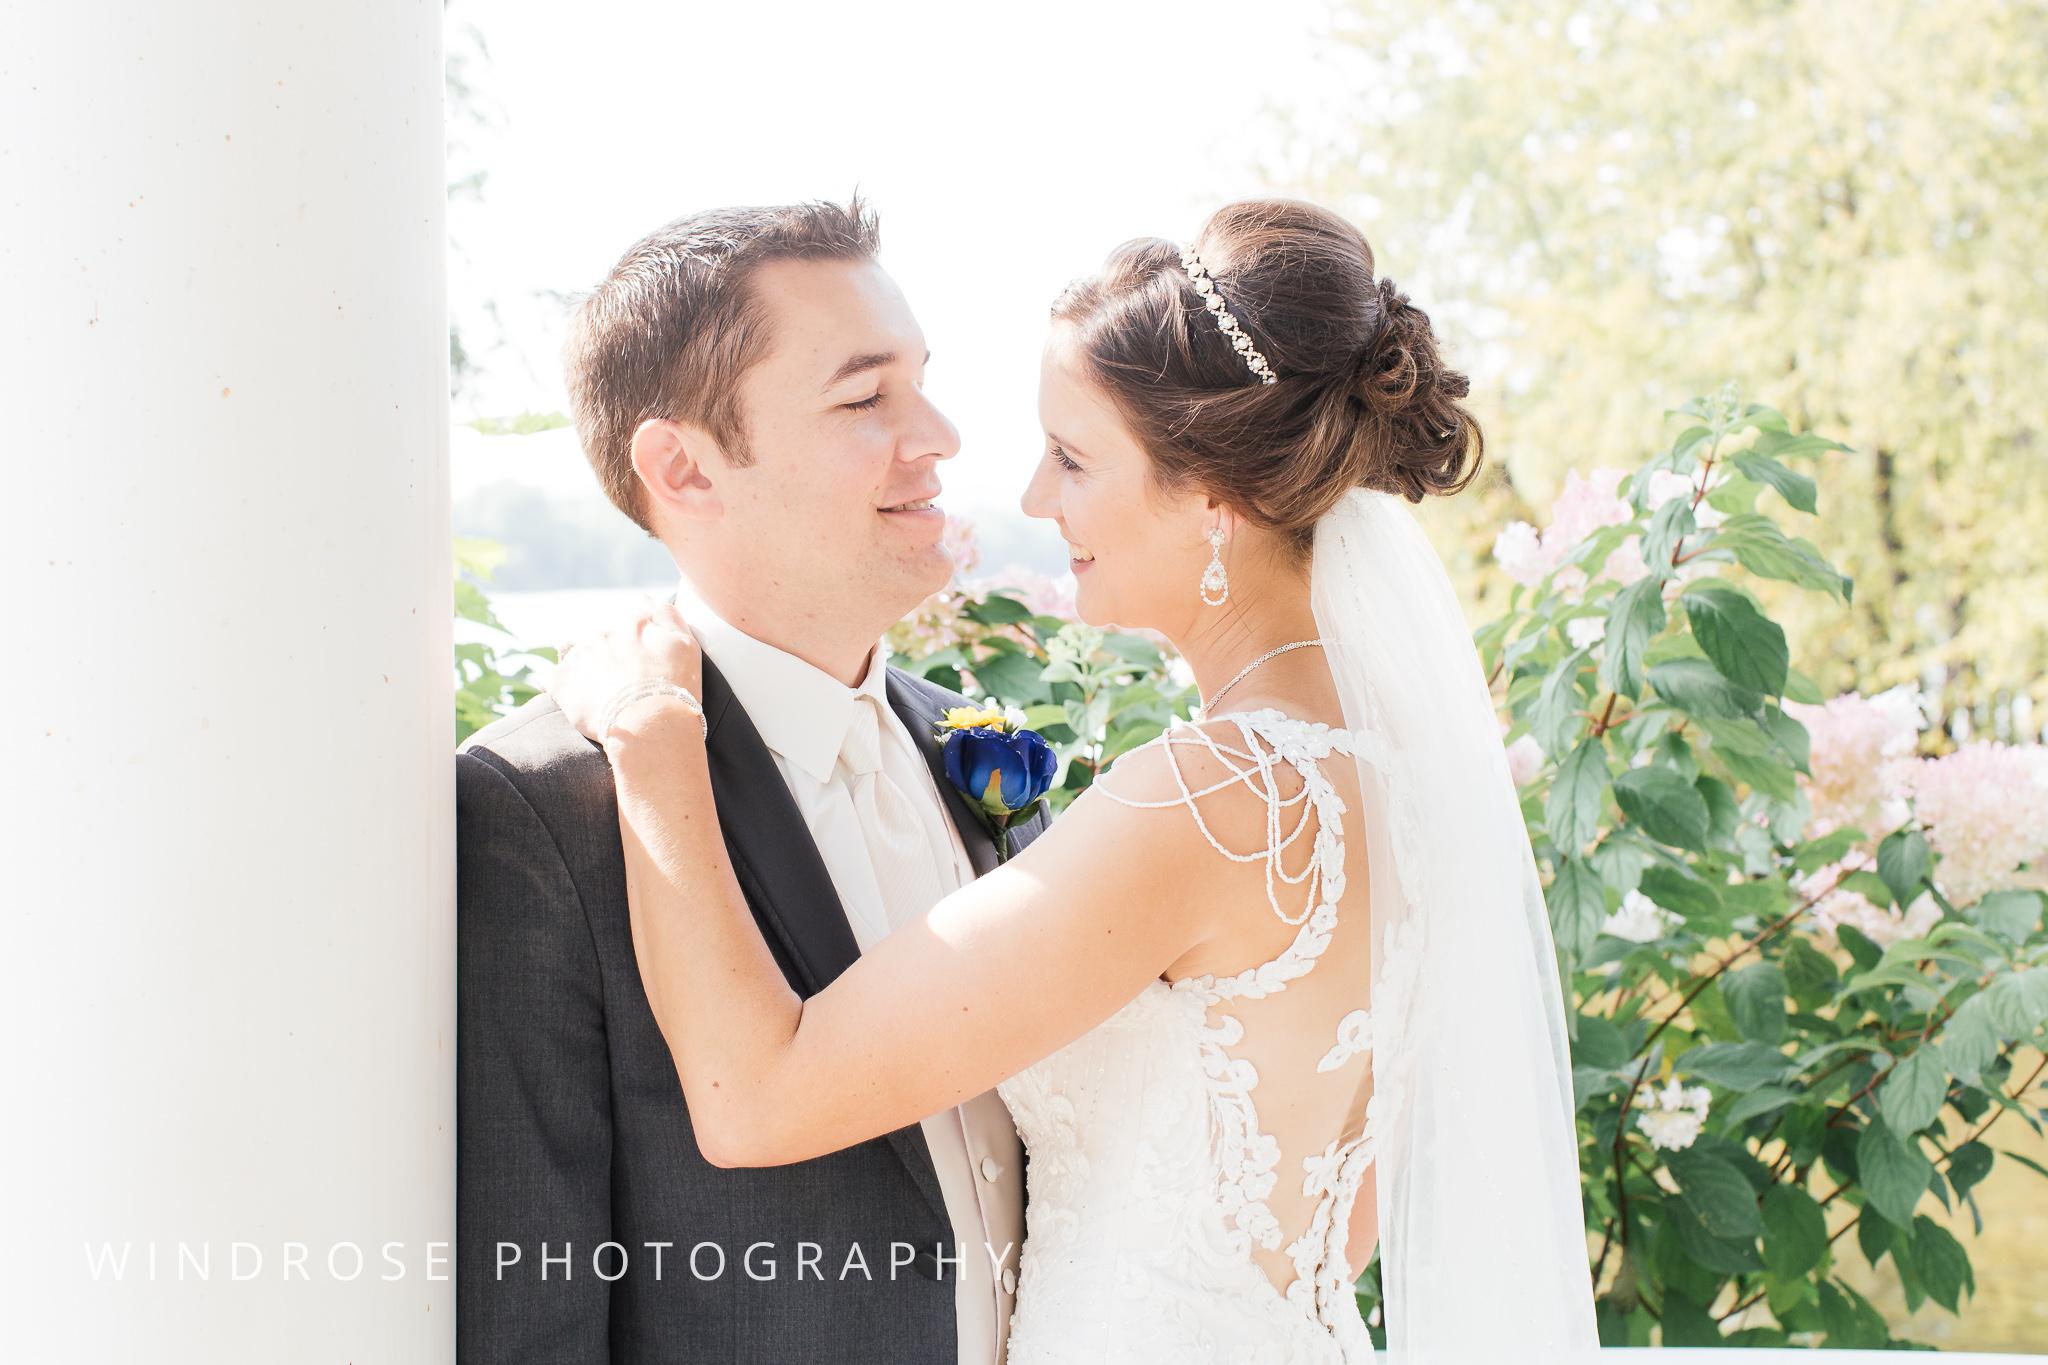 La-Crosse-Country-Club-Wedding-Minnesota-Wedding-Photographer-32.jpg